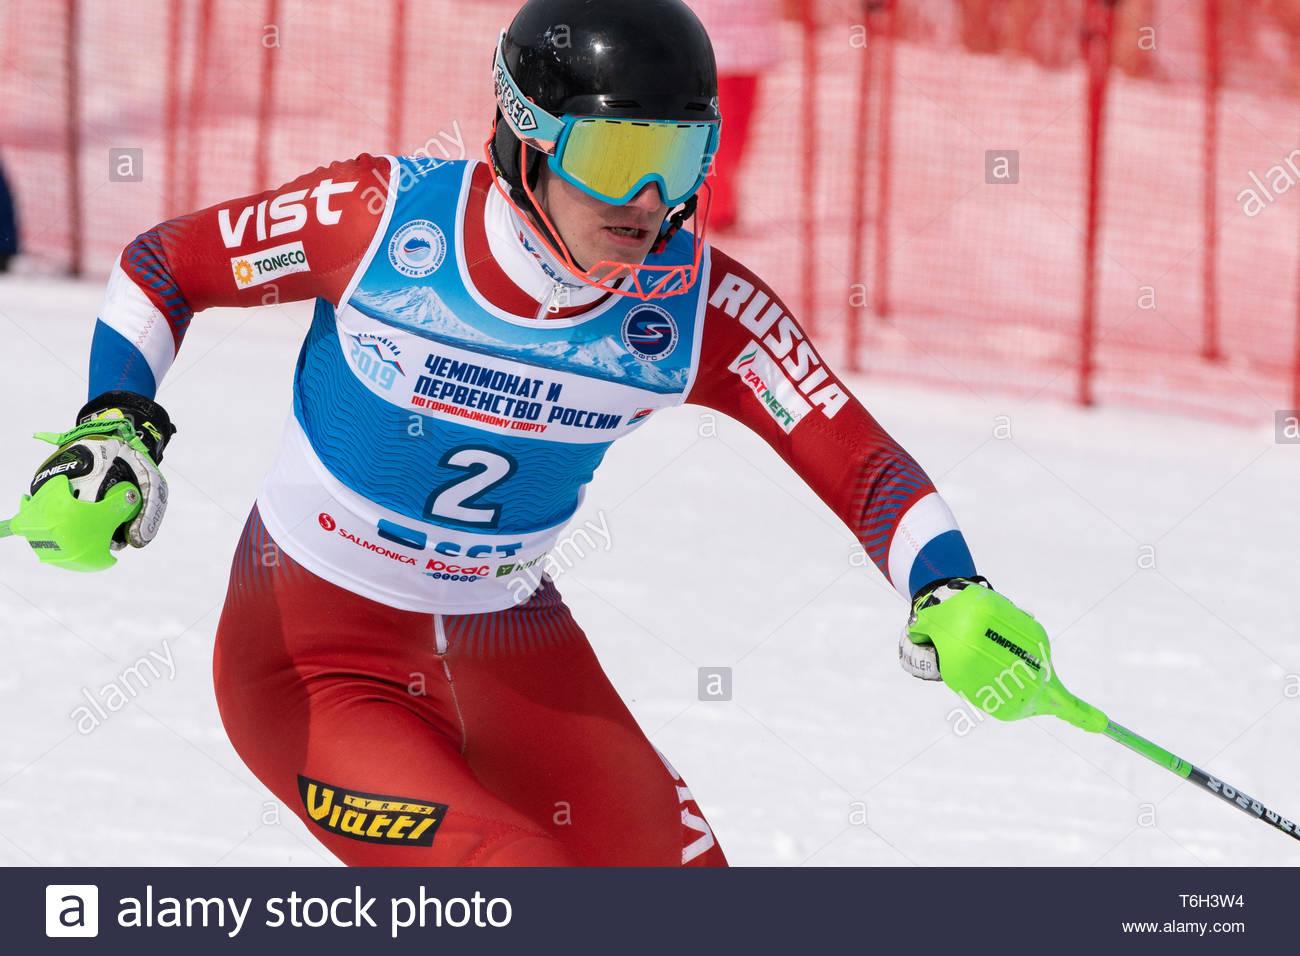 MOROZNAYA MOUNTAIN, KAMCHATKA, RUSSIA - MAR 28, 2019: Russian Alpine Skiing Cup, International Ski Federation Championship slalom. Skier Ovchinnikov A Stock Photo